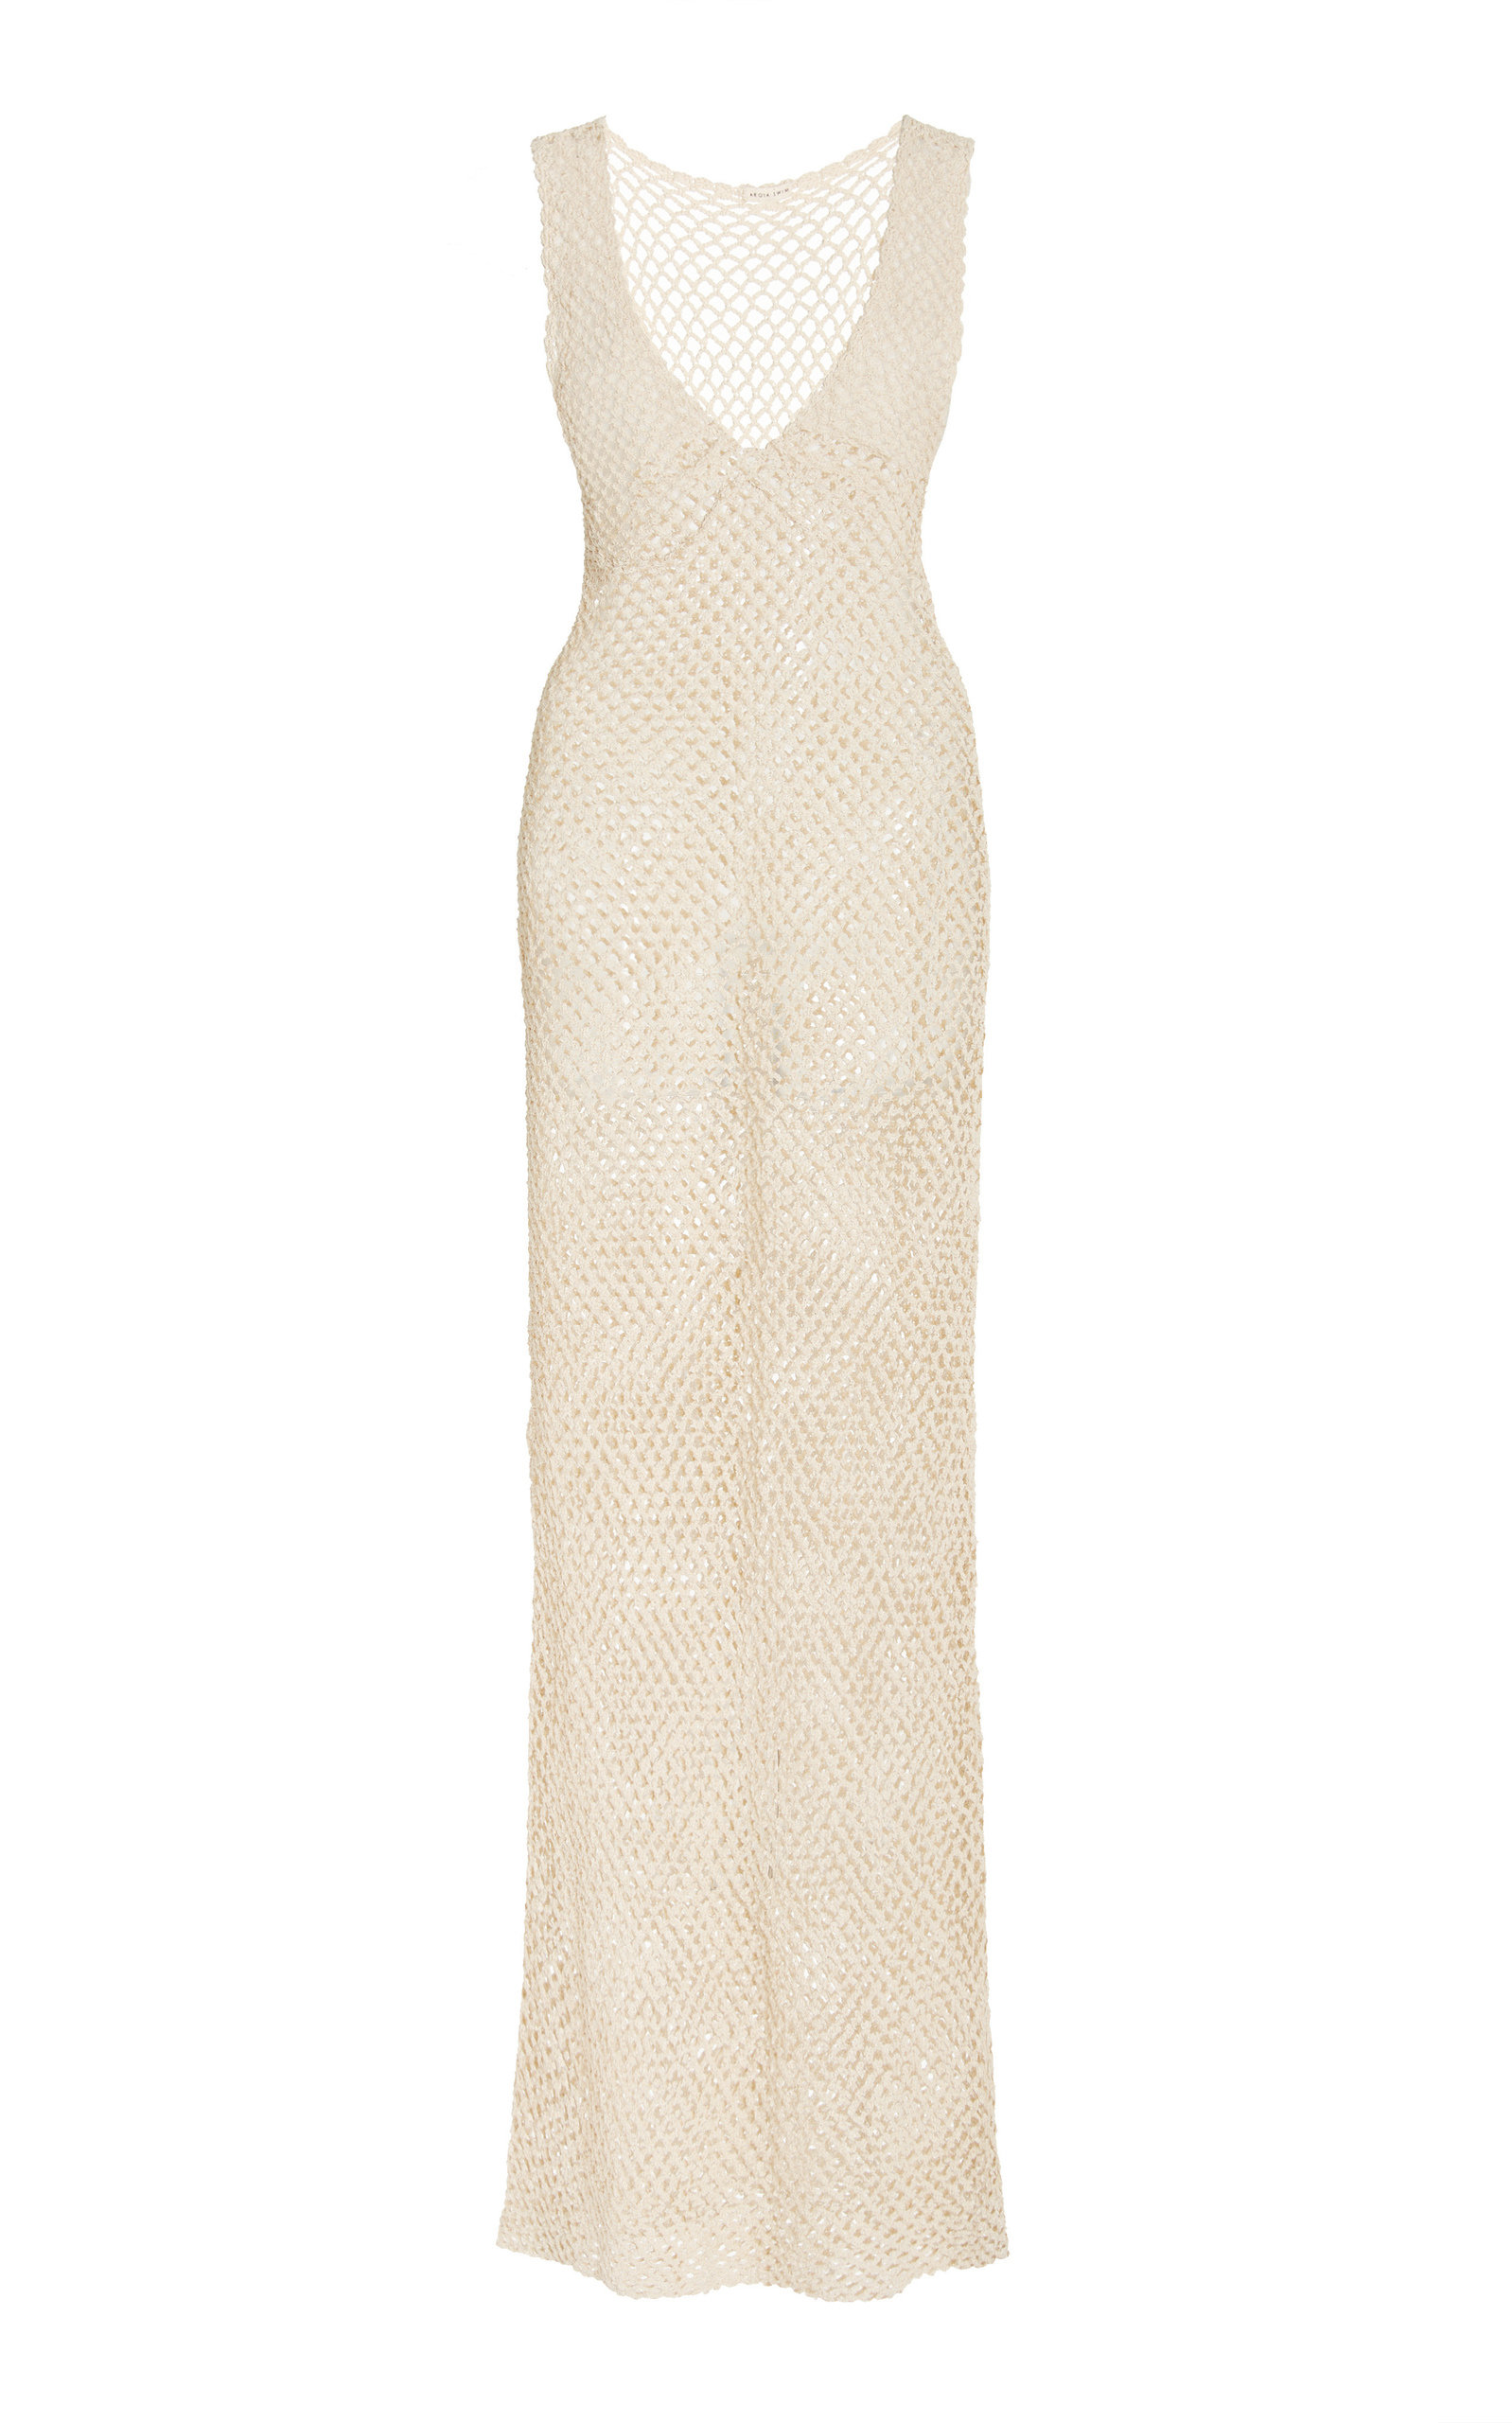 Akoia Swim - Women's Karu Crocheted Cotton Maxi Dress - White - Moda Operandi